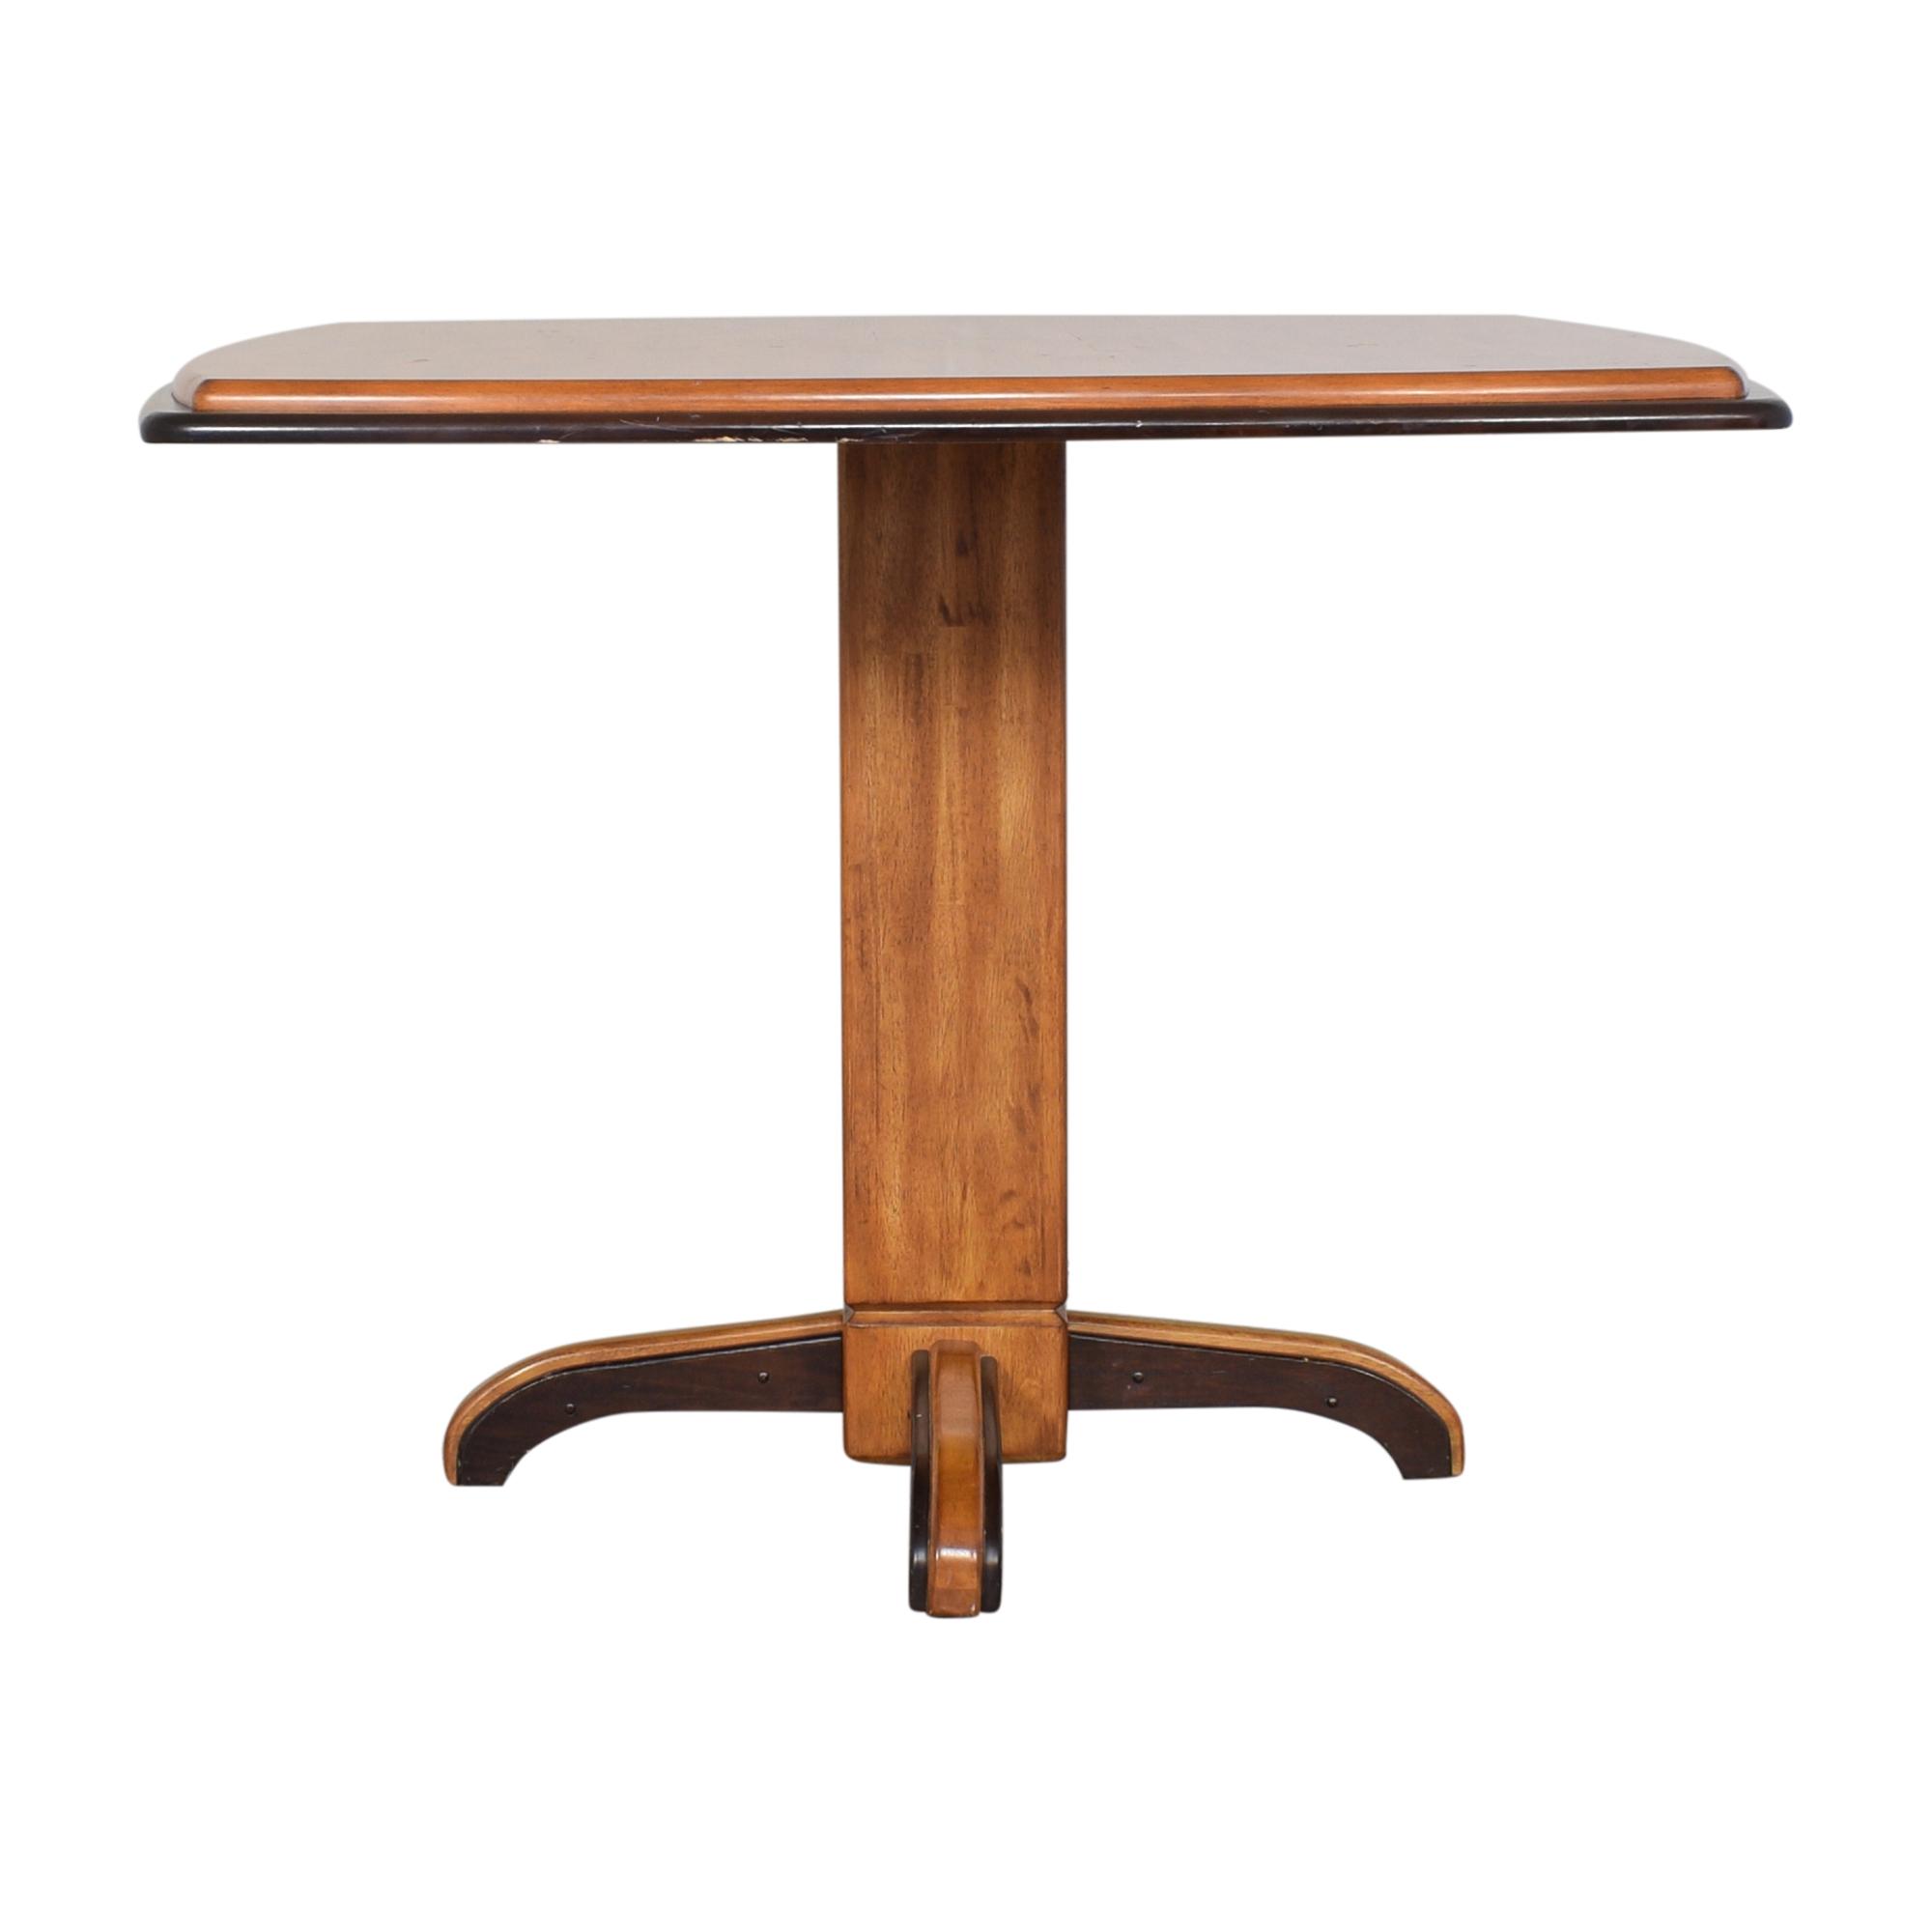 Ashley Furniture Ashley Furniture Urbandale Square Pedestal Dining Table on sale